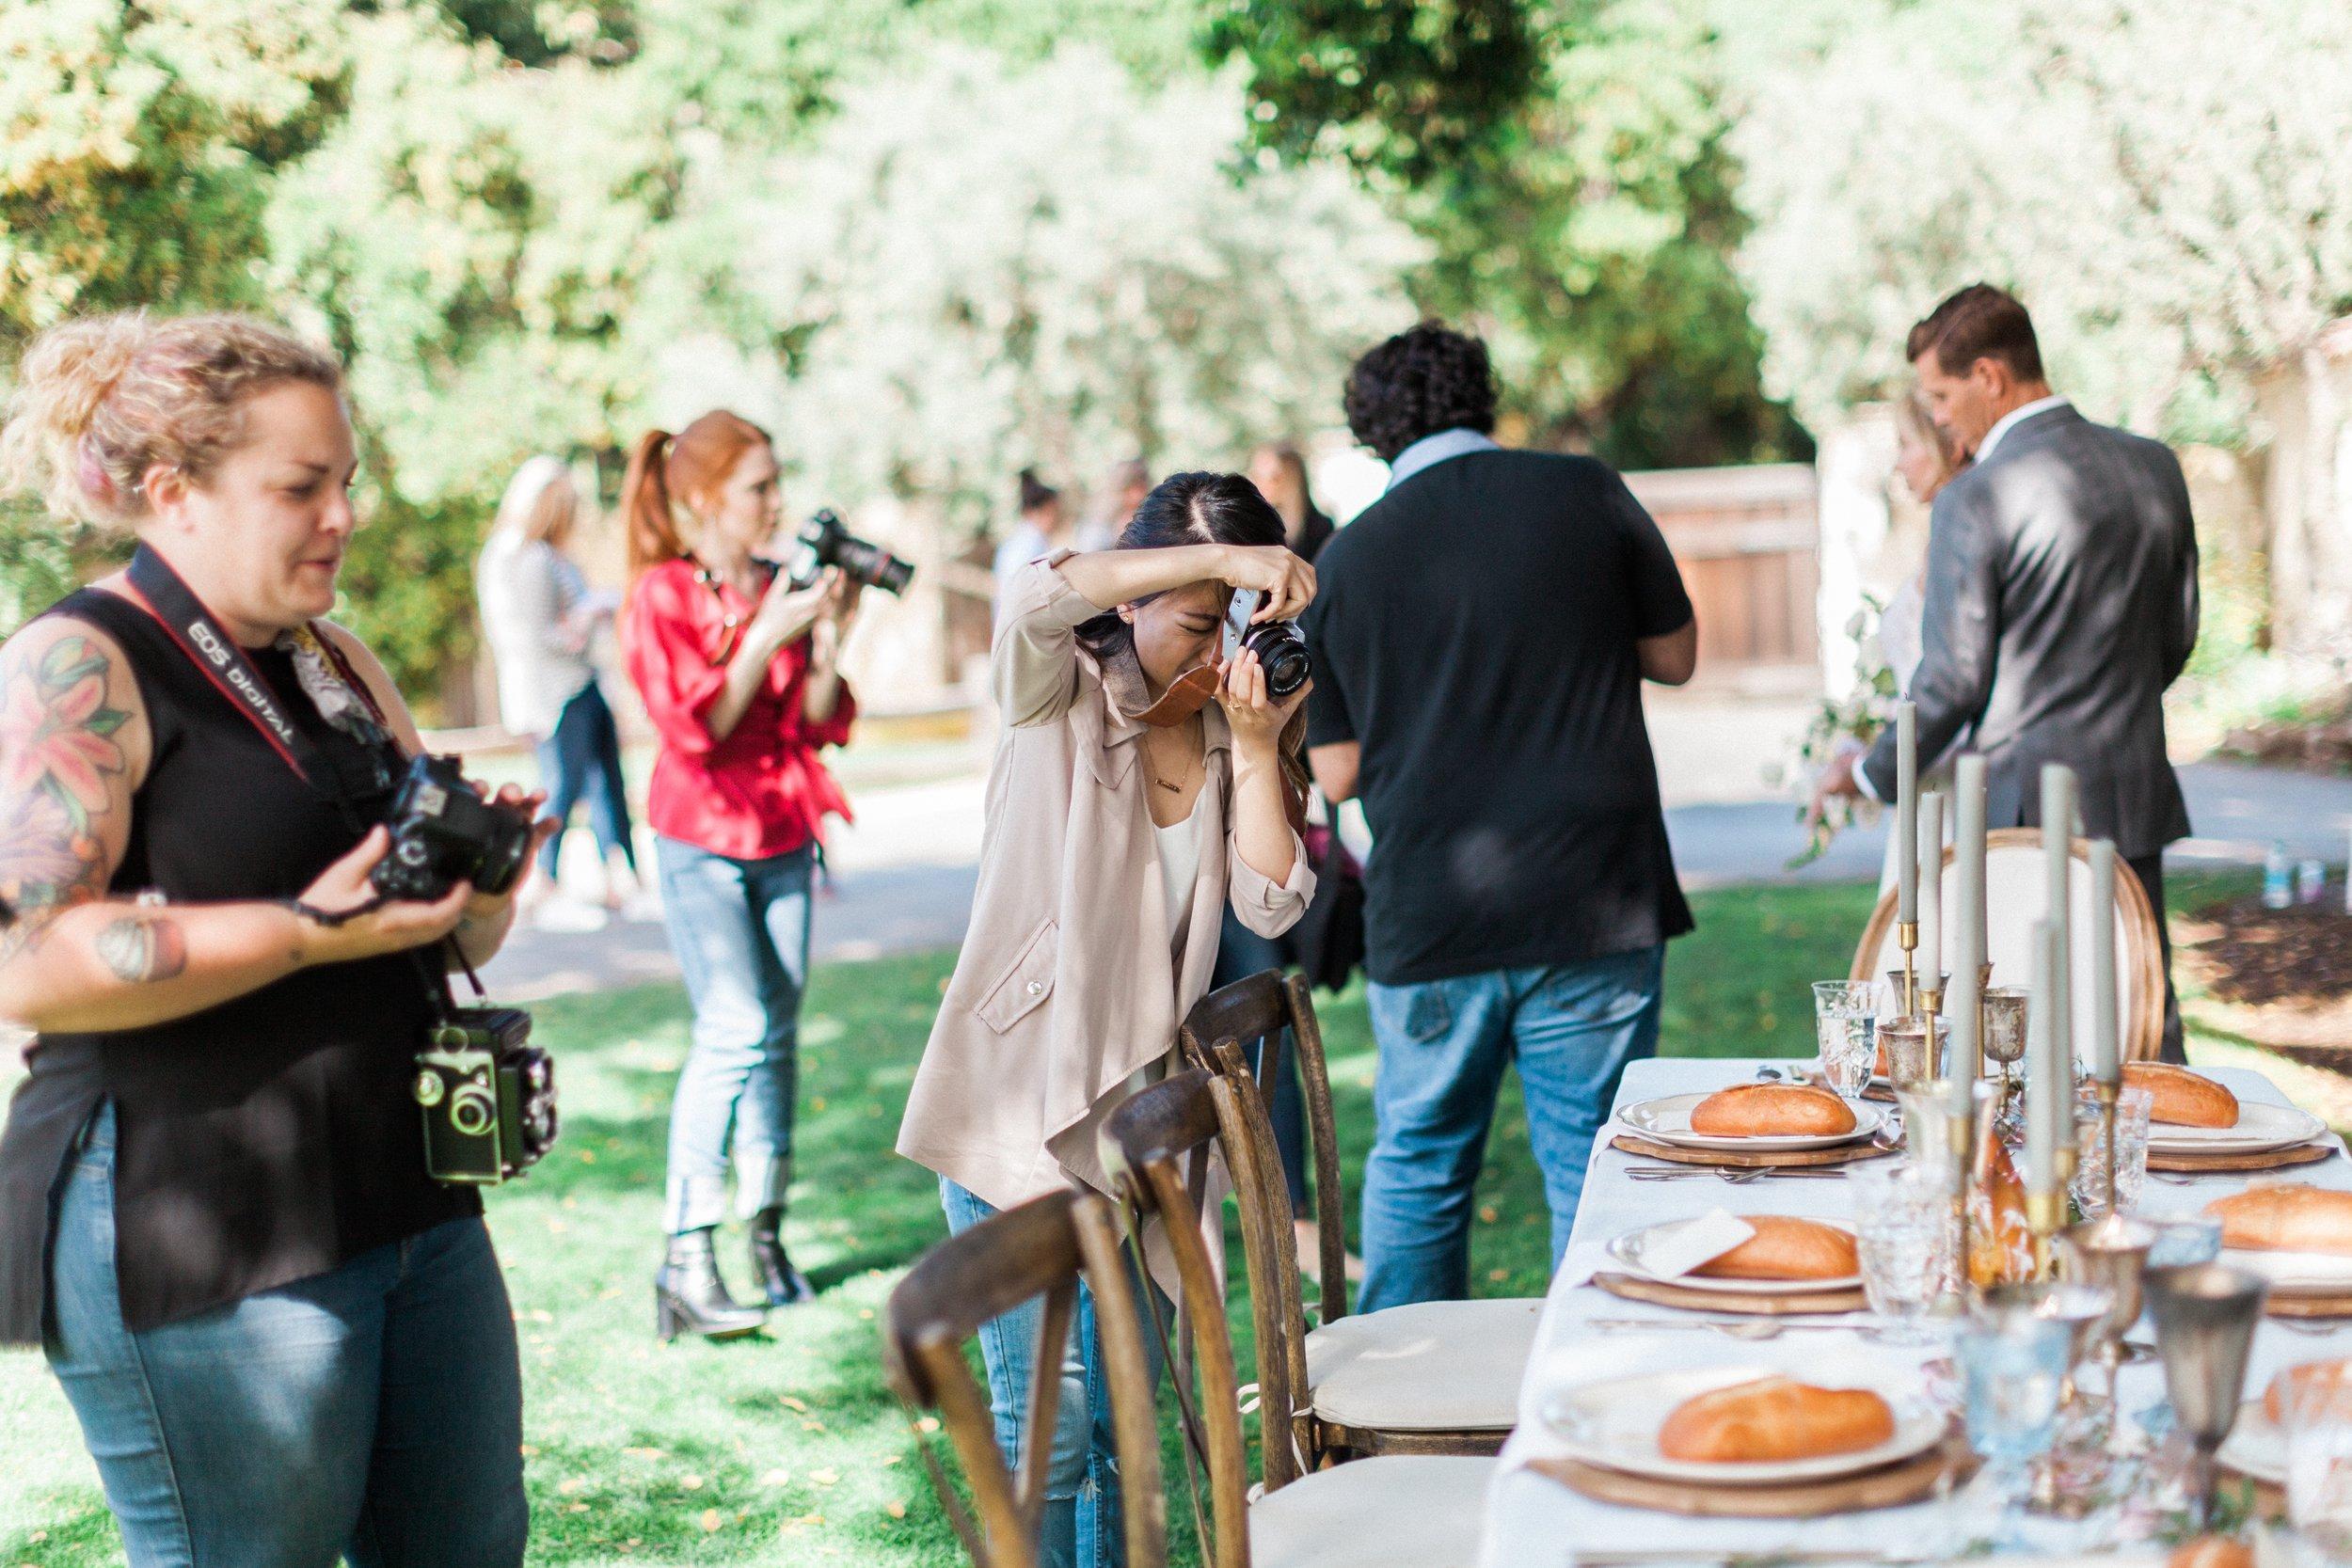 Ragi-and-Amanda-Bloom-Workshop-Carmel-363.jpg